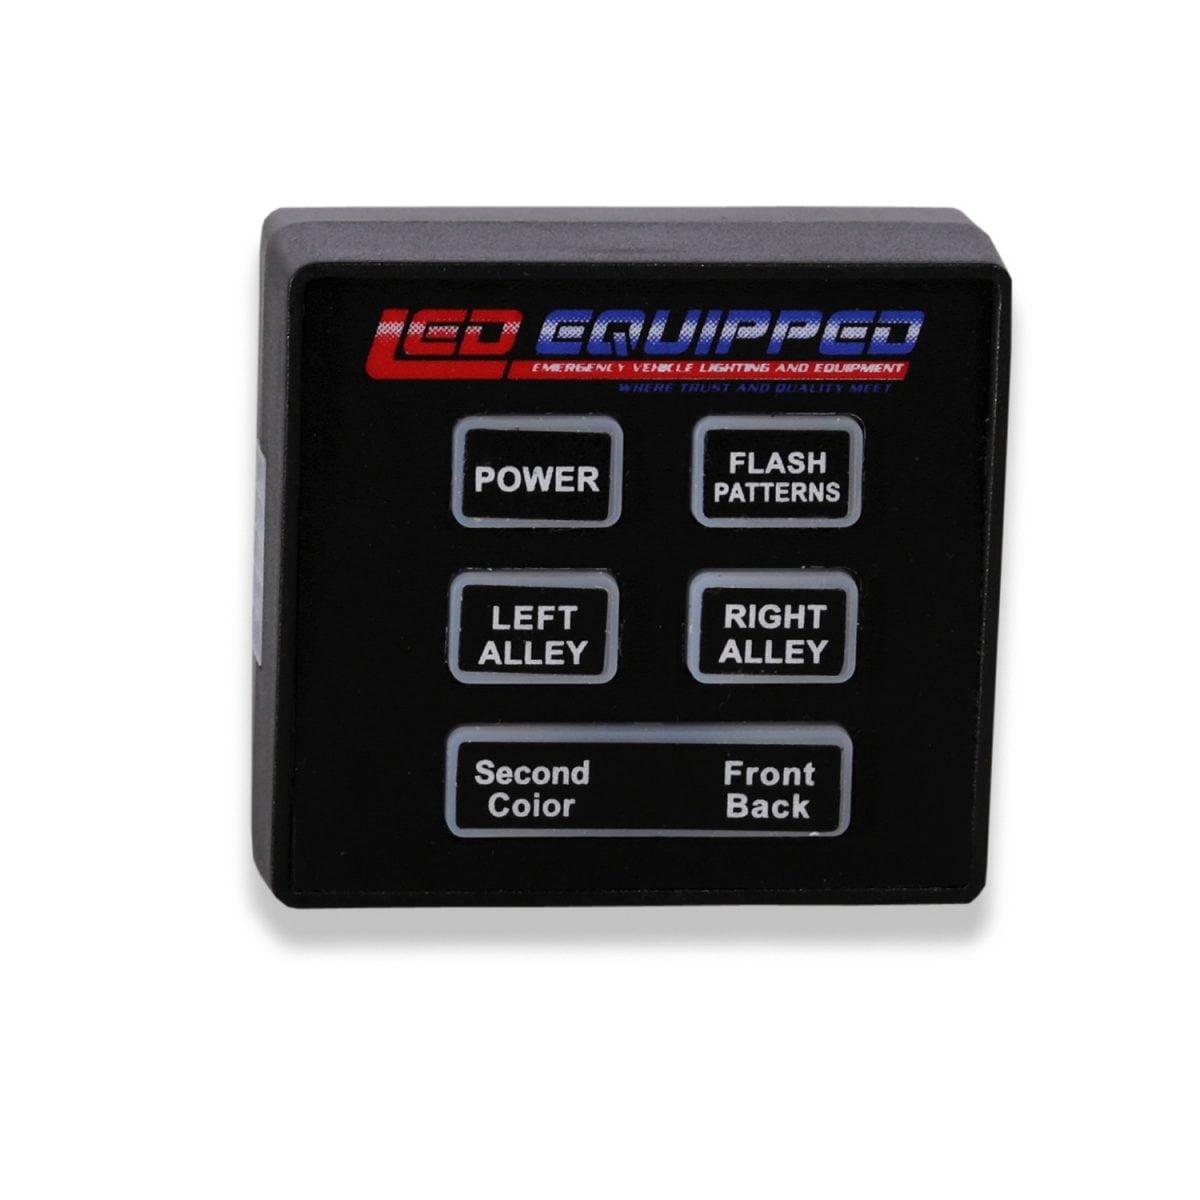 Condor Tir Emergency 3 Watt Led Light Bar 23in Wiring Diagram - Collection